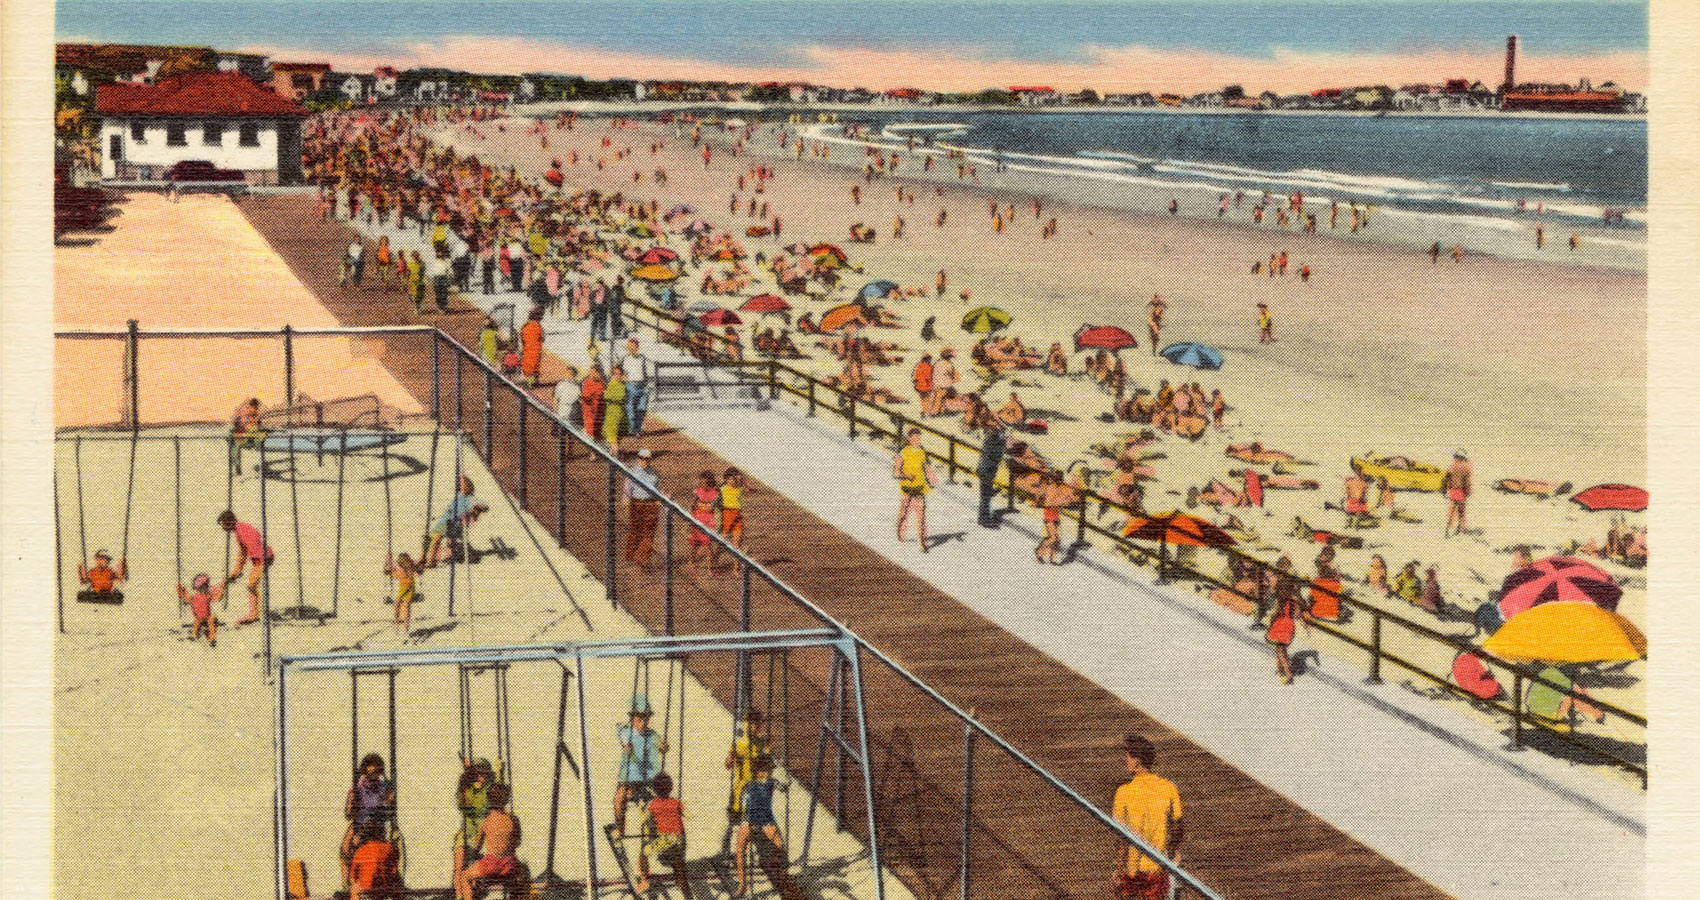 Hampton Beach by Mario William Vitaleat Spillwords.com